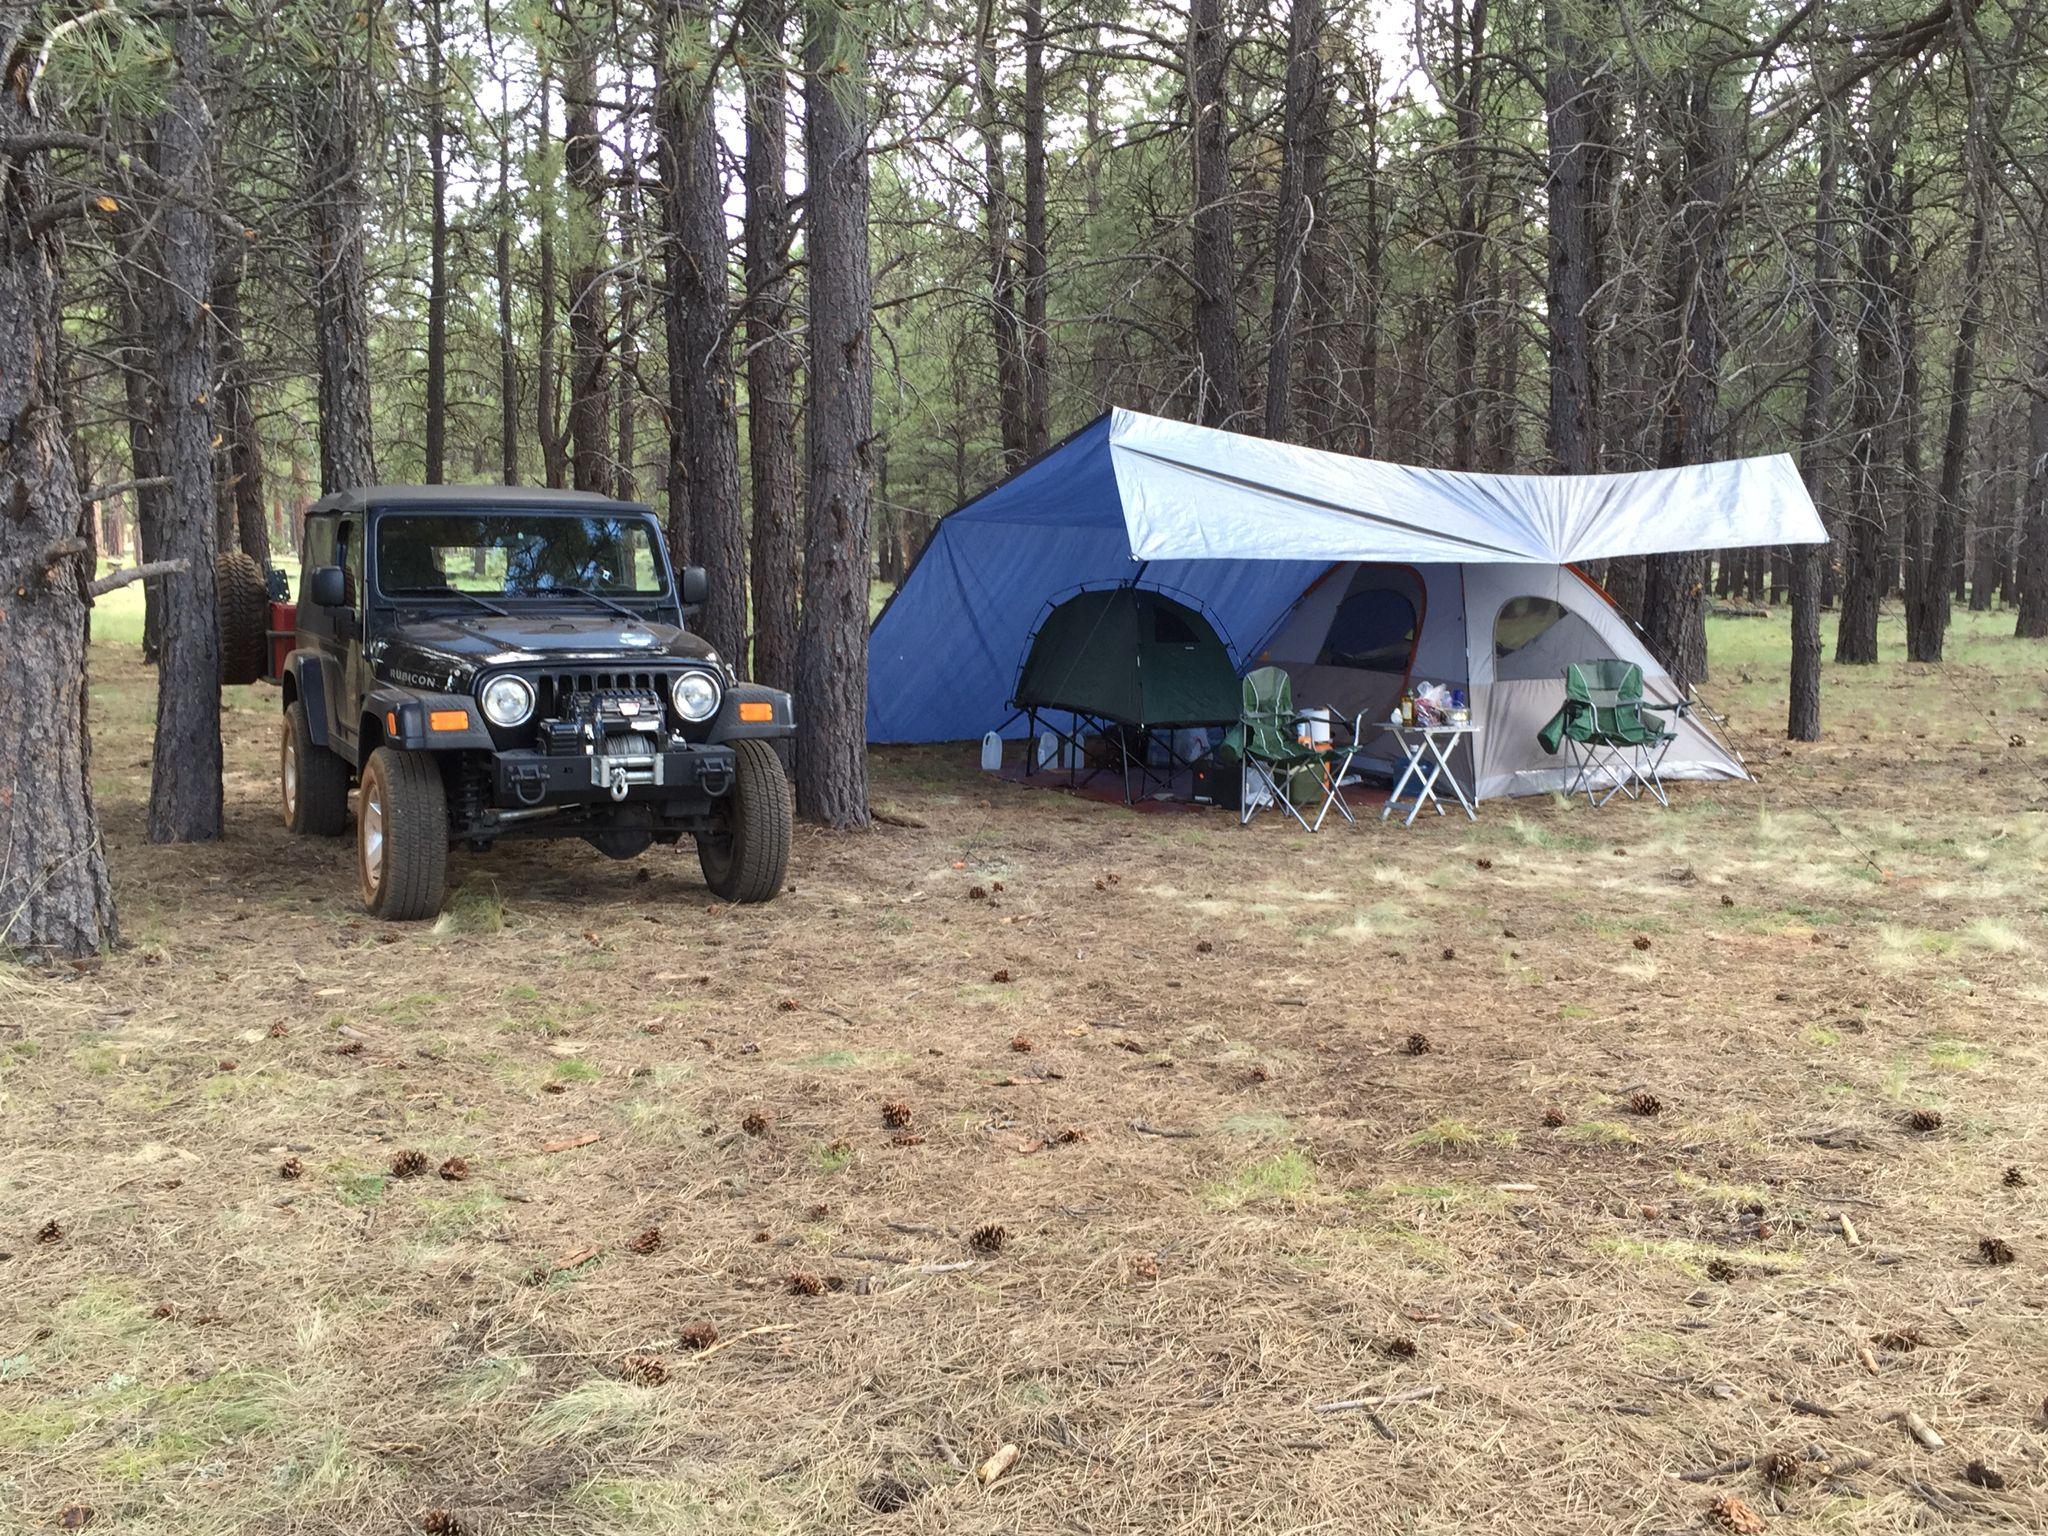 Camping in Flagstaff!  Beautiful. So much fun.